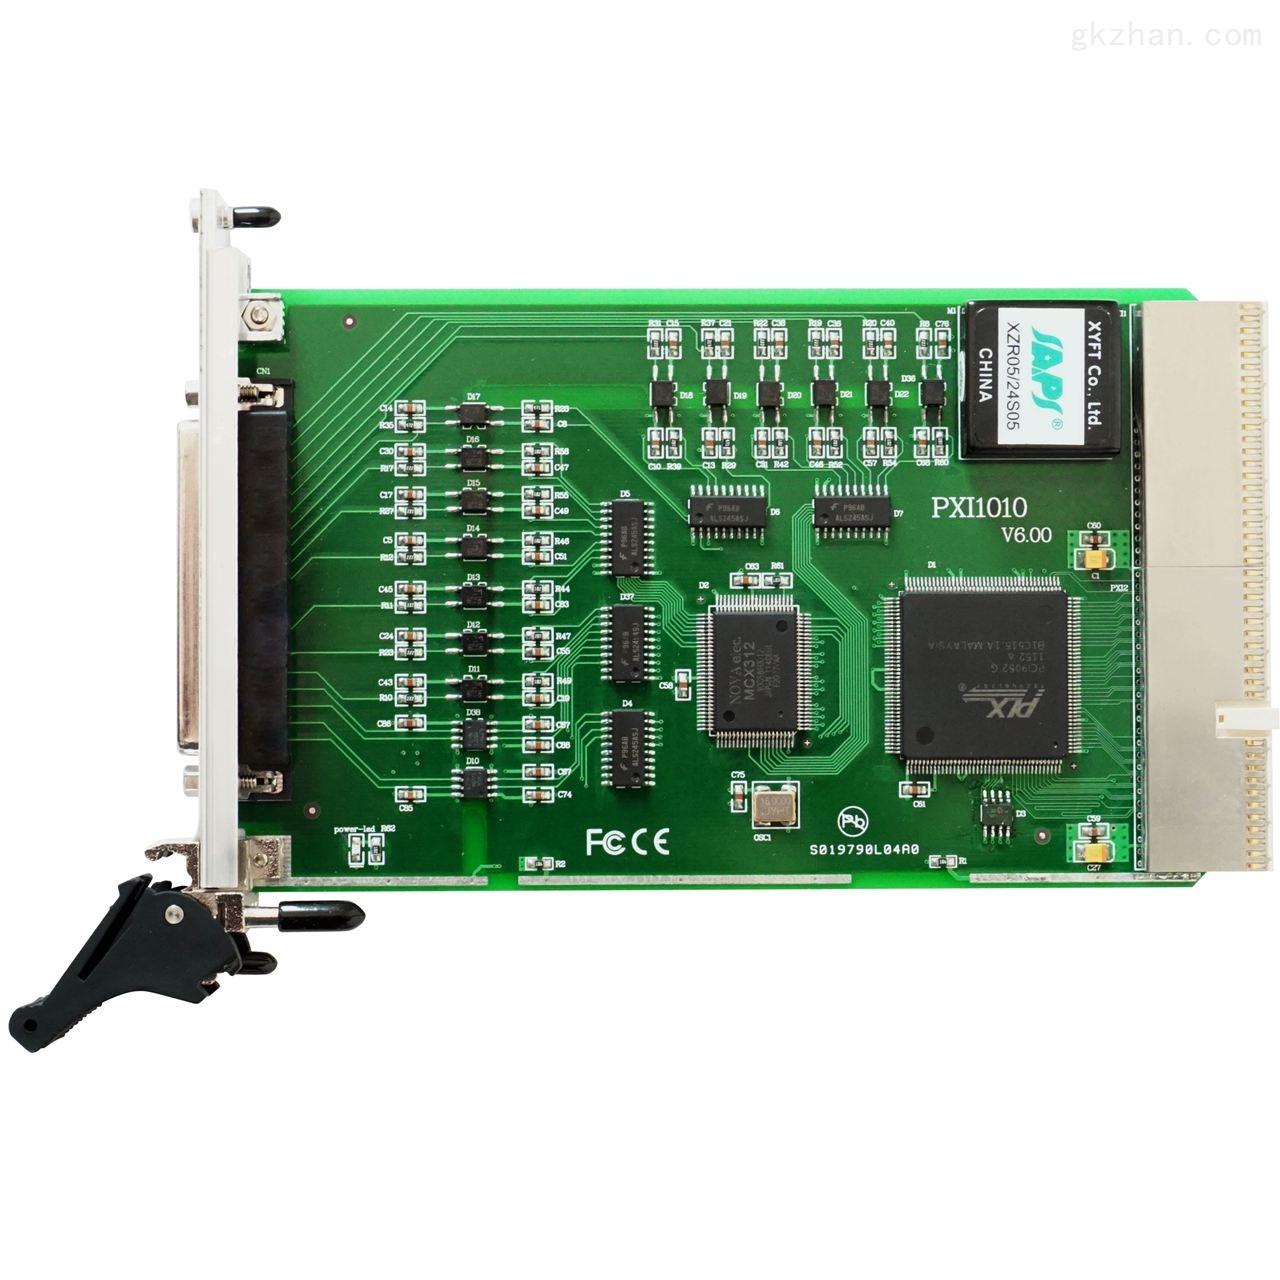 PXI1010 --阿��泰科技PXI����立2�S��舆\�涌刂瓶�